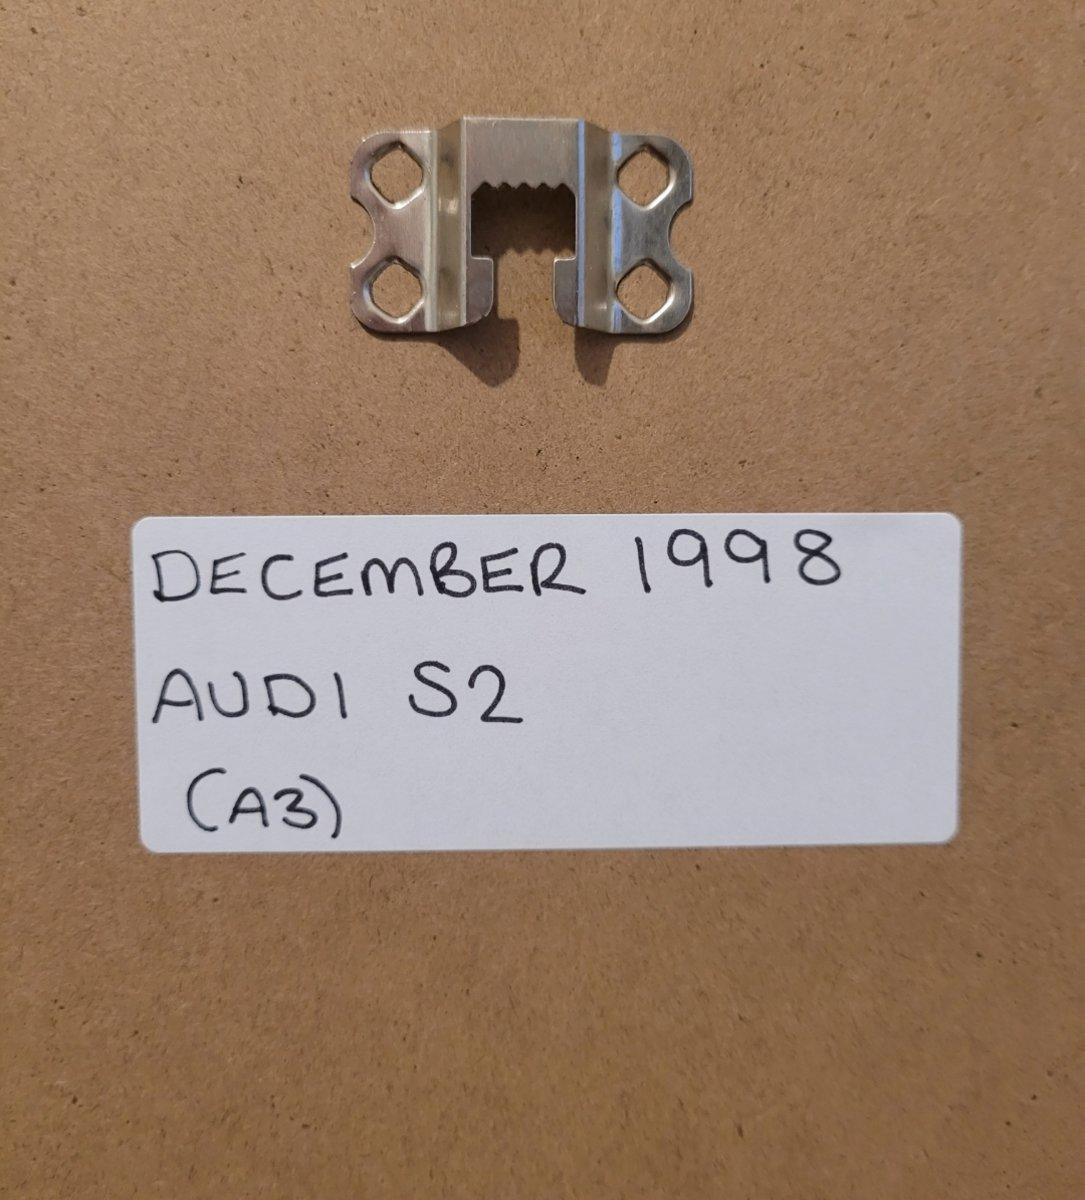 1984 Original 1998 Audi S2 Framed Advert For Sale (picture 2 of 3)